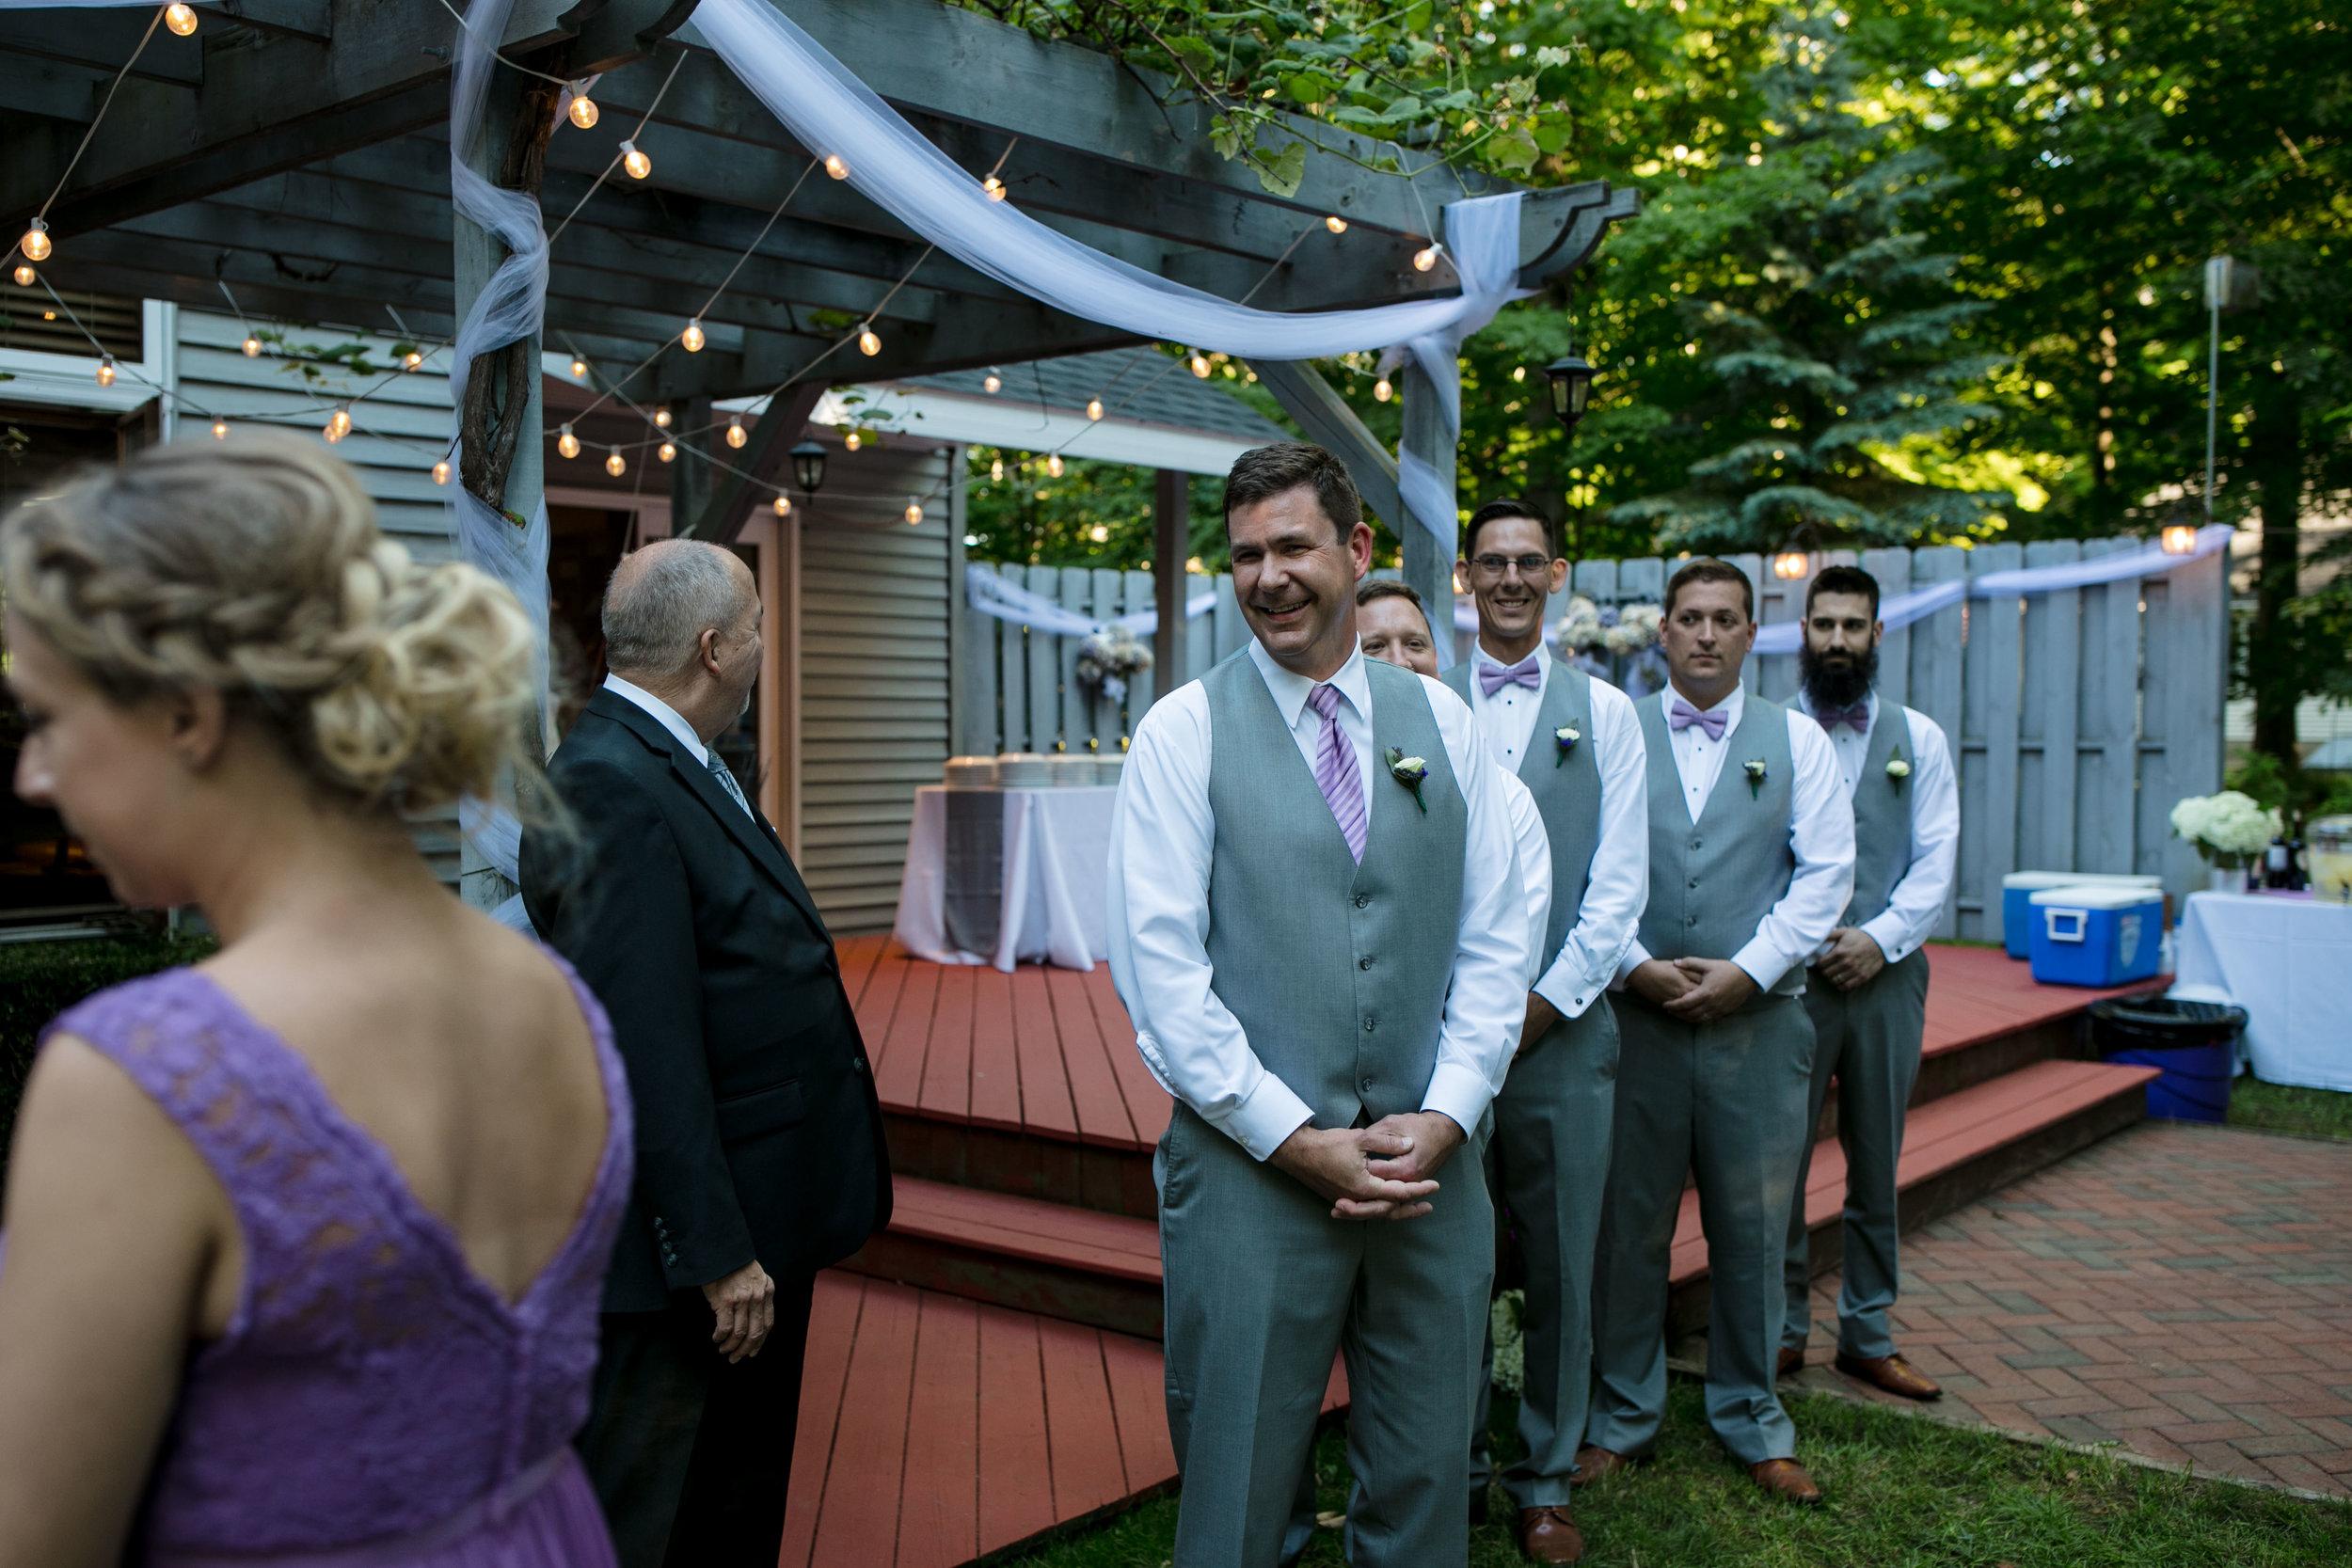 ludington-michigan-intimate-backyard-wedding-jessica-nolan237.jpg